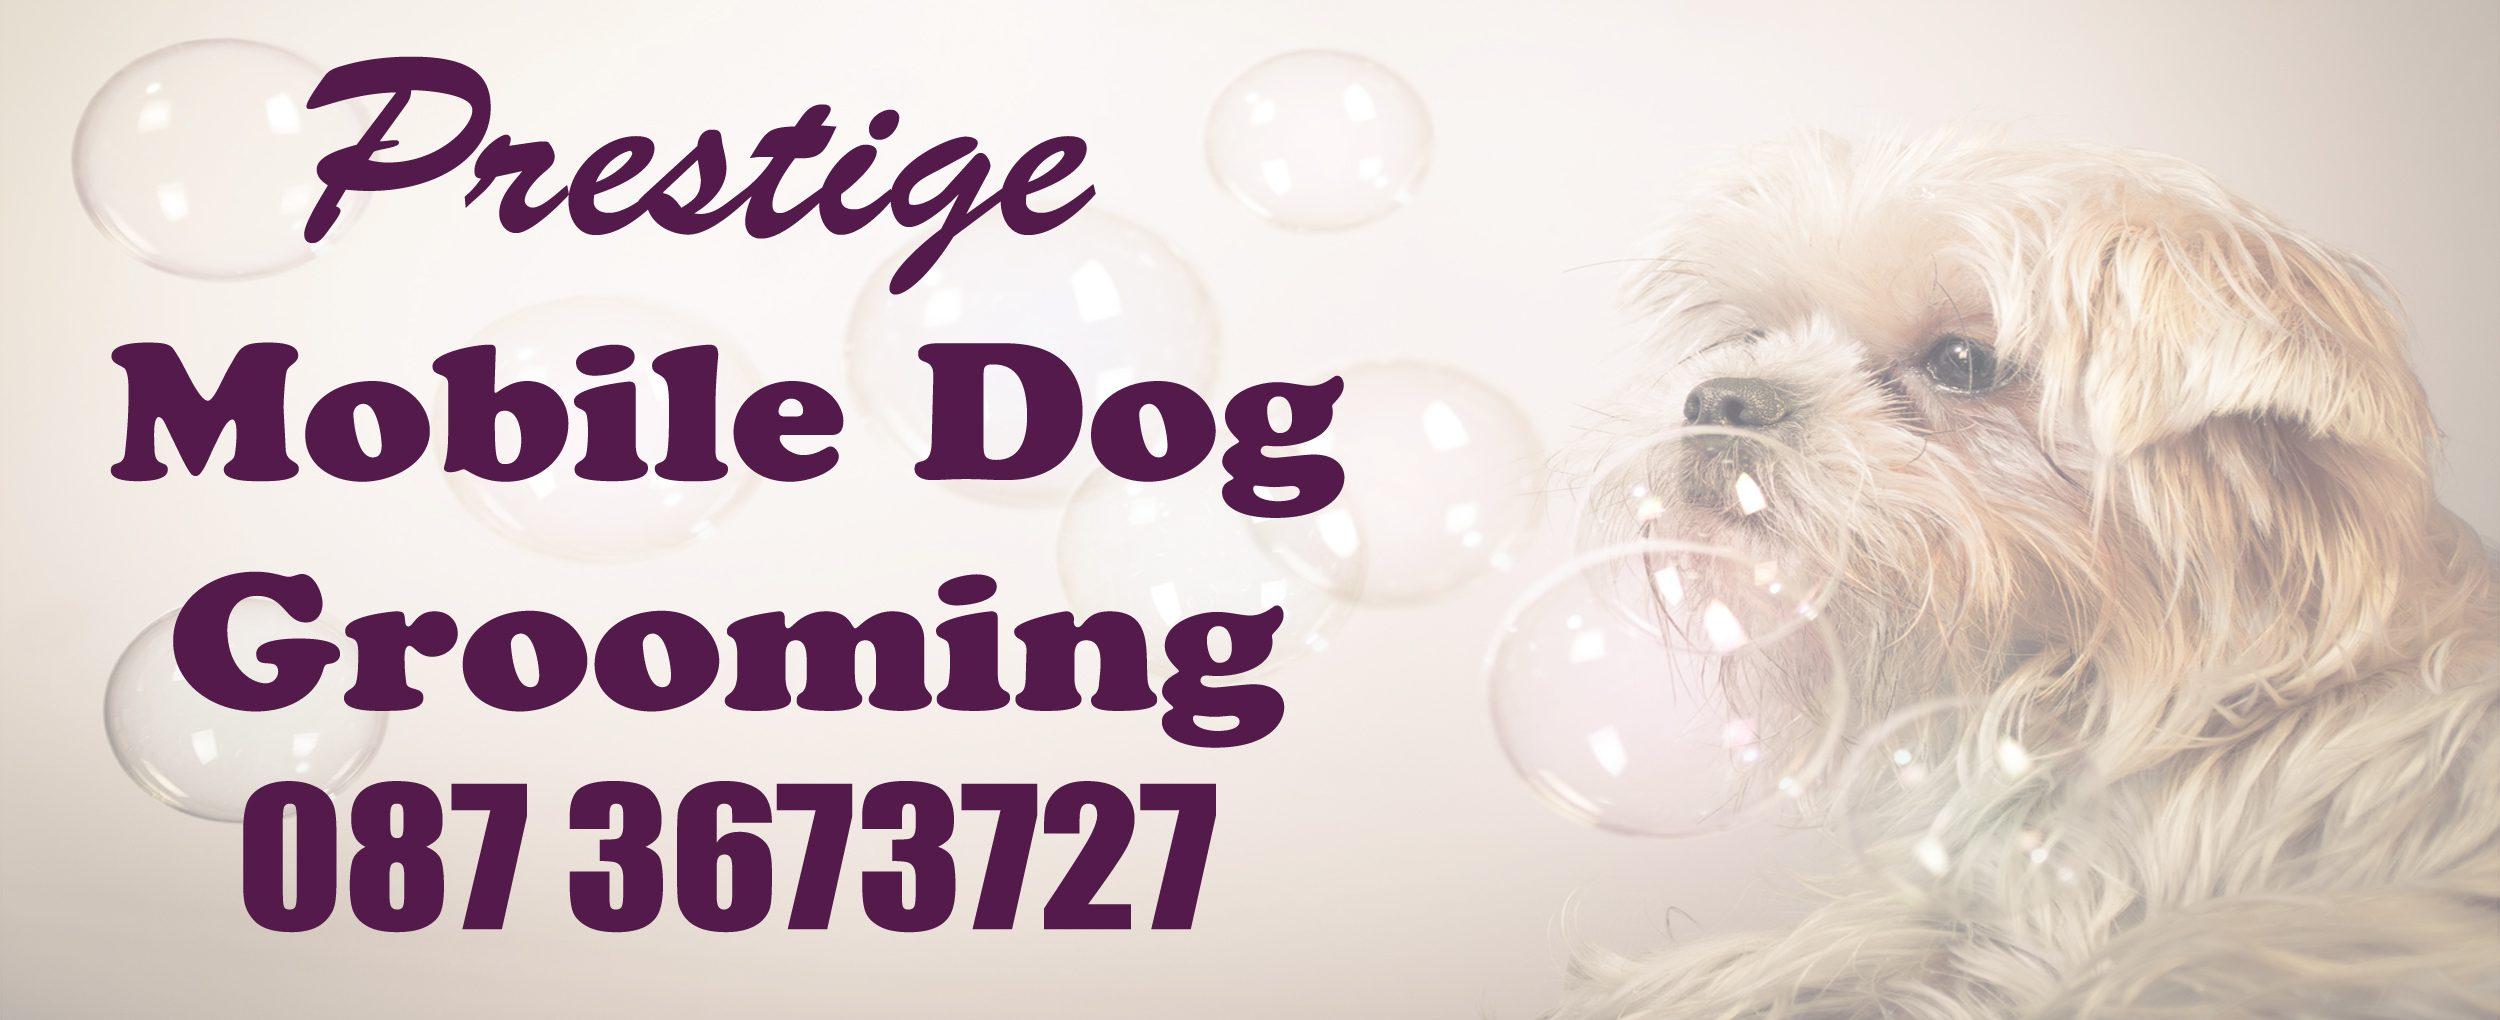 www.prestigemobiledoggrooming.ie